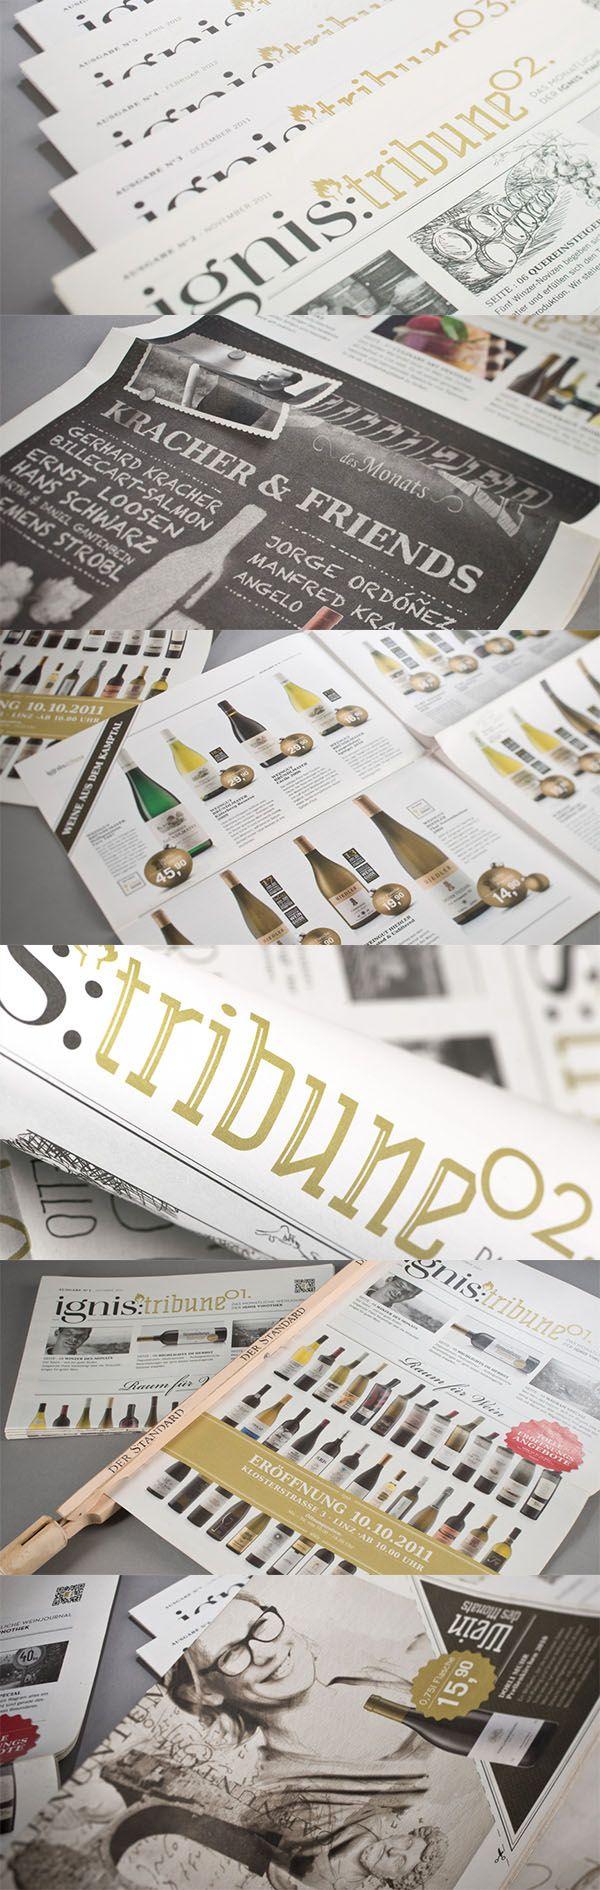 IGNIS VINOTHEKEN // Flugblatt www.lunik2.com #leaflet #print #branding #marketing #creative #wine #befirst